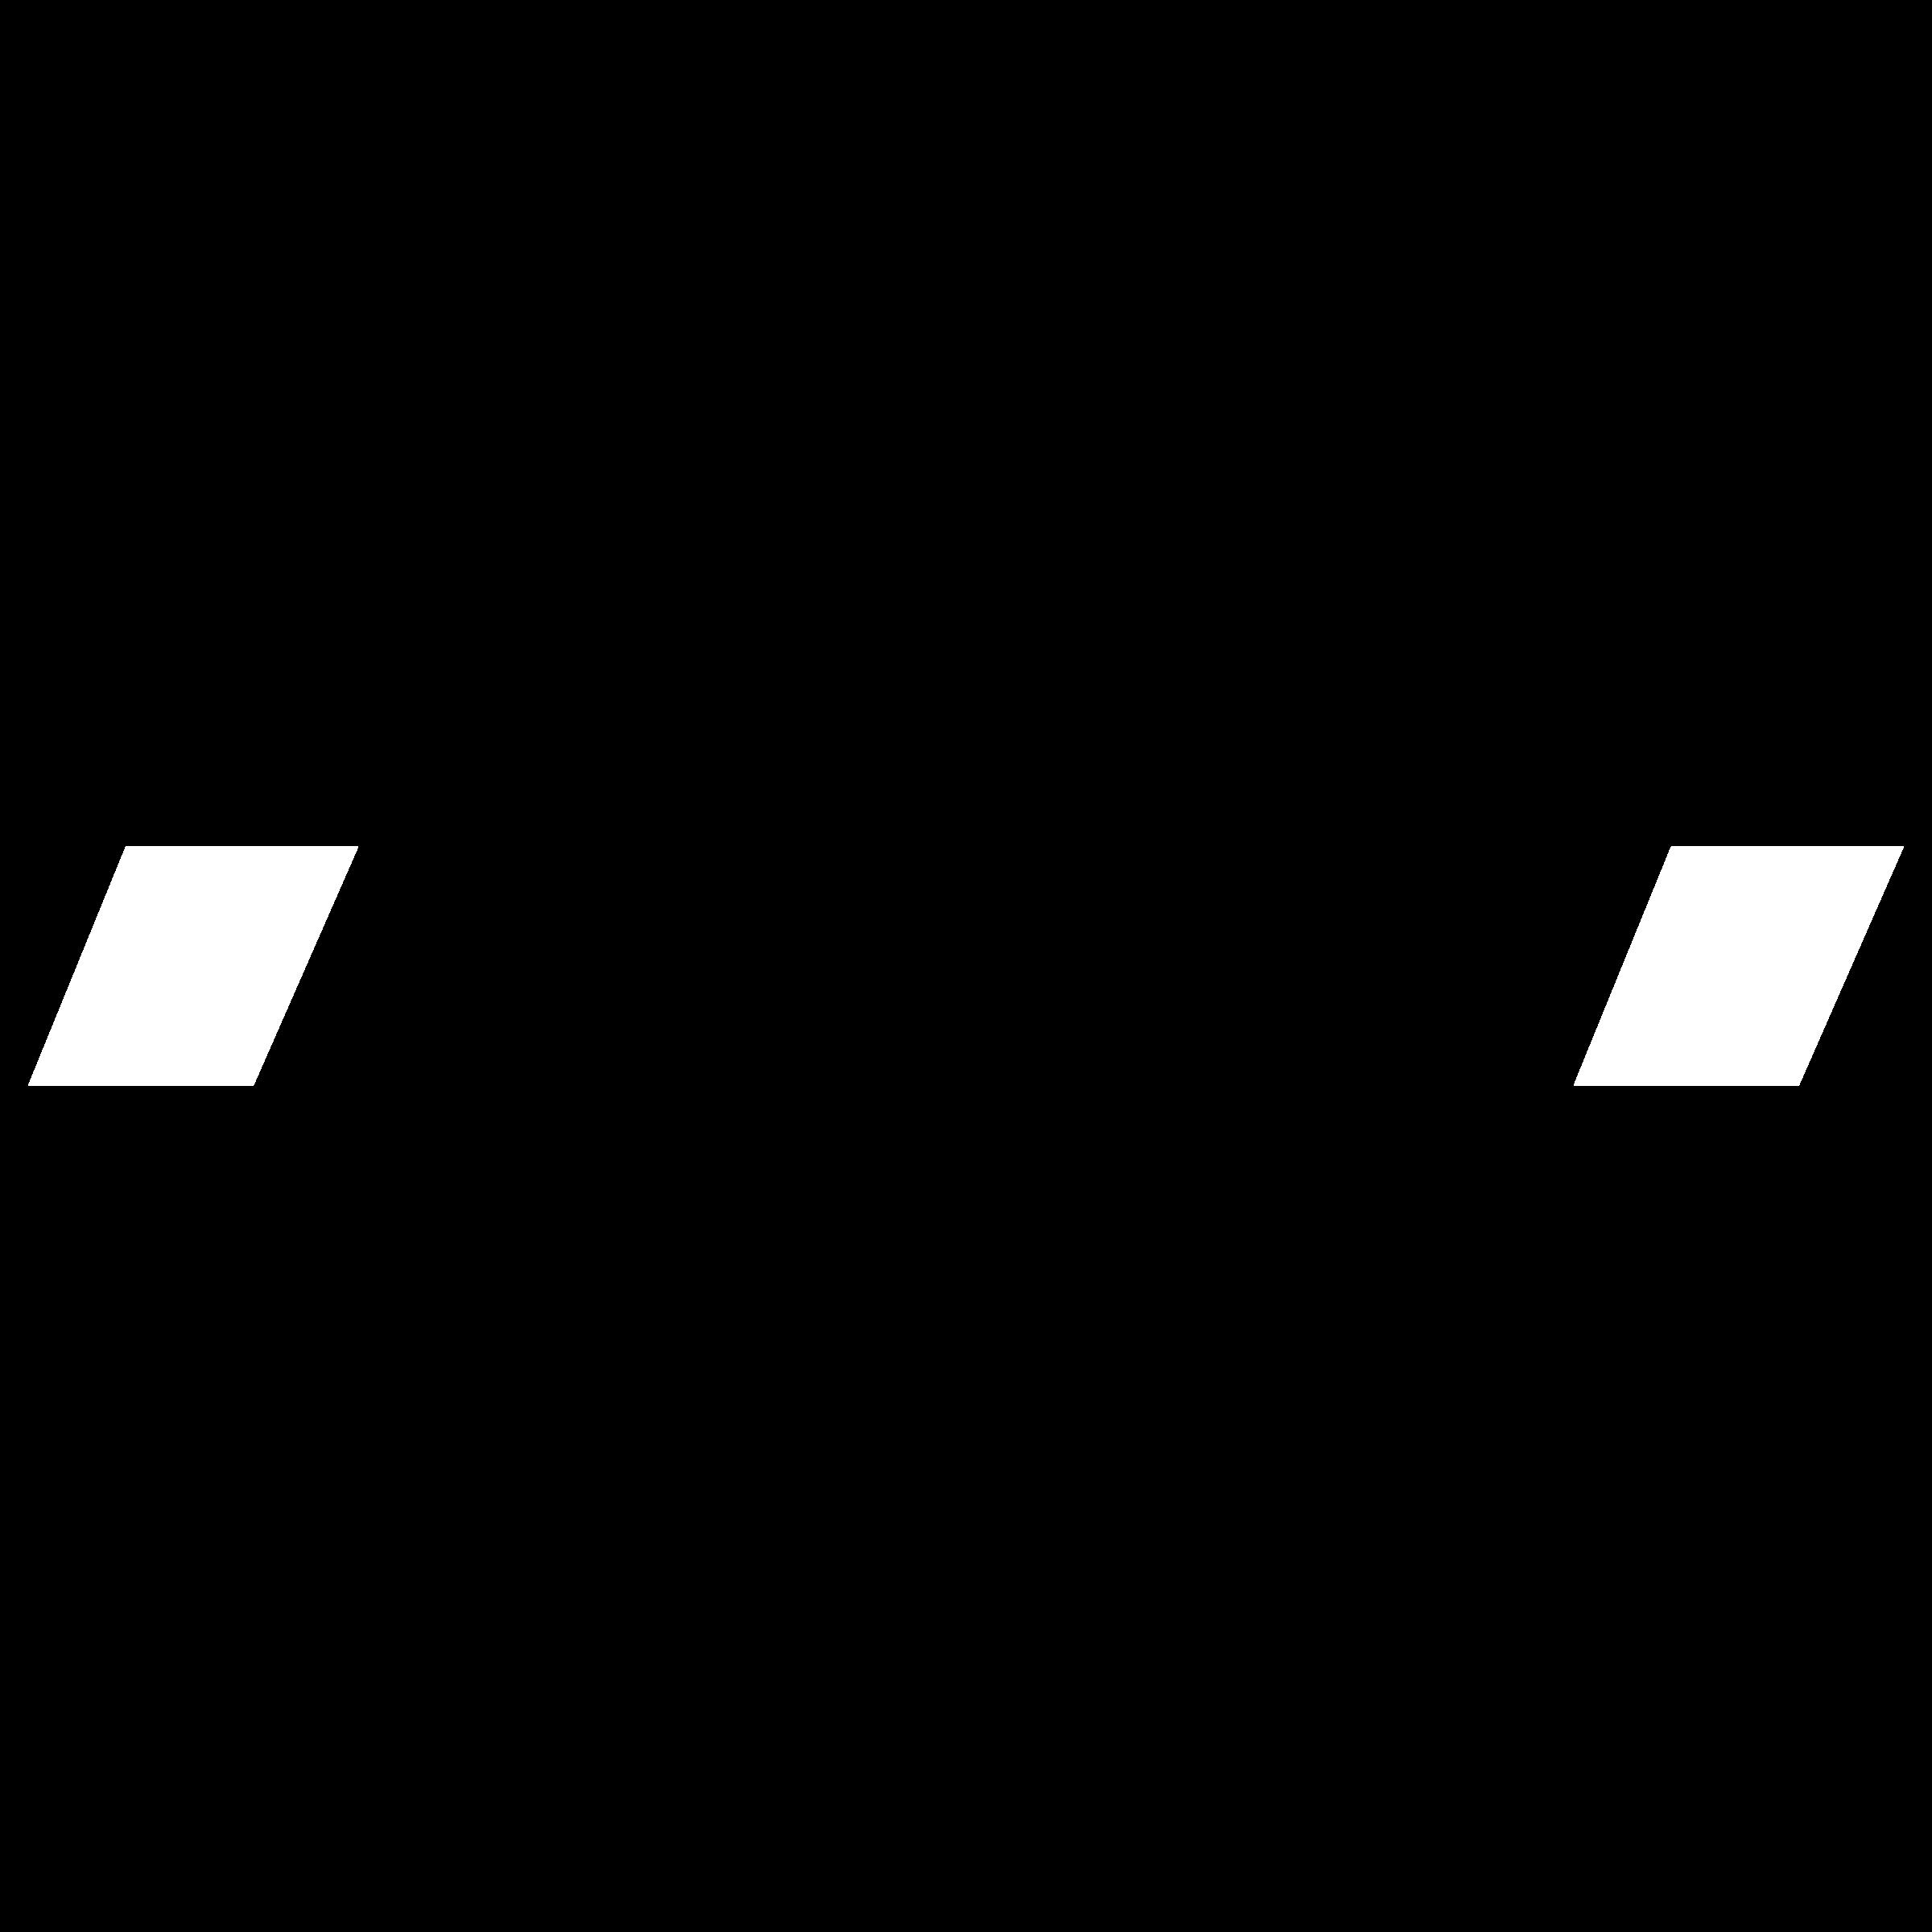 Uniroyal Logo PNG Transparent & SVG Vector.